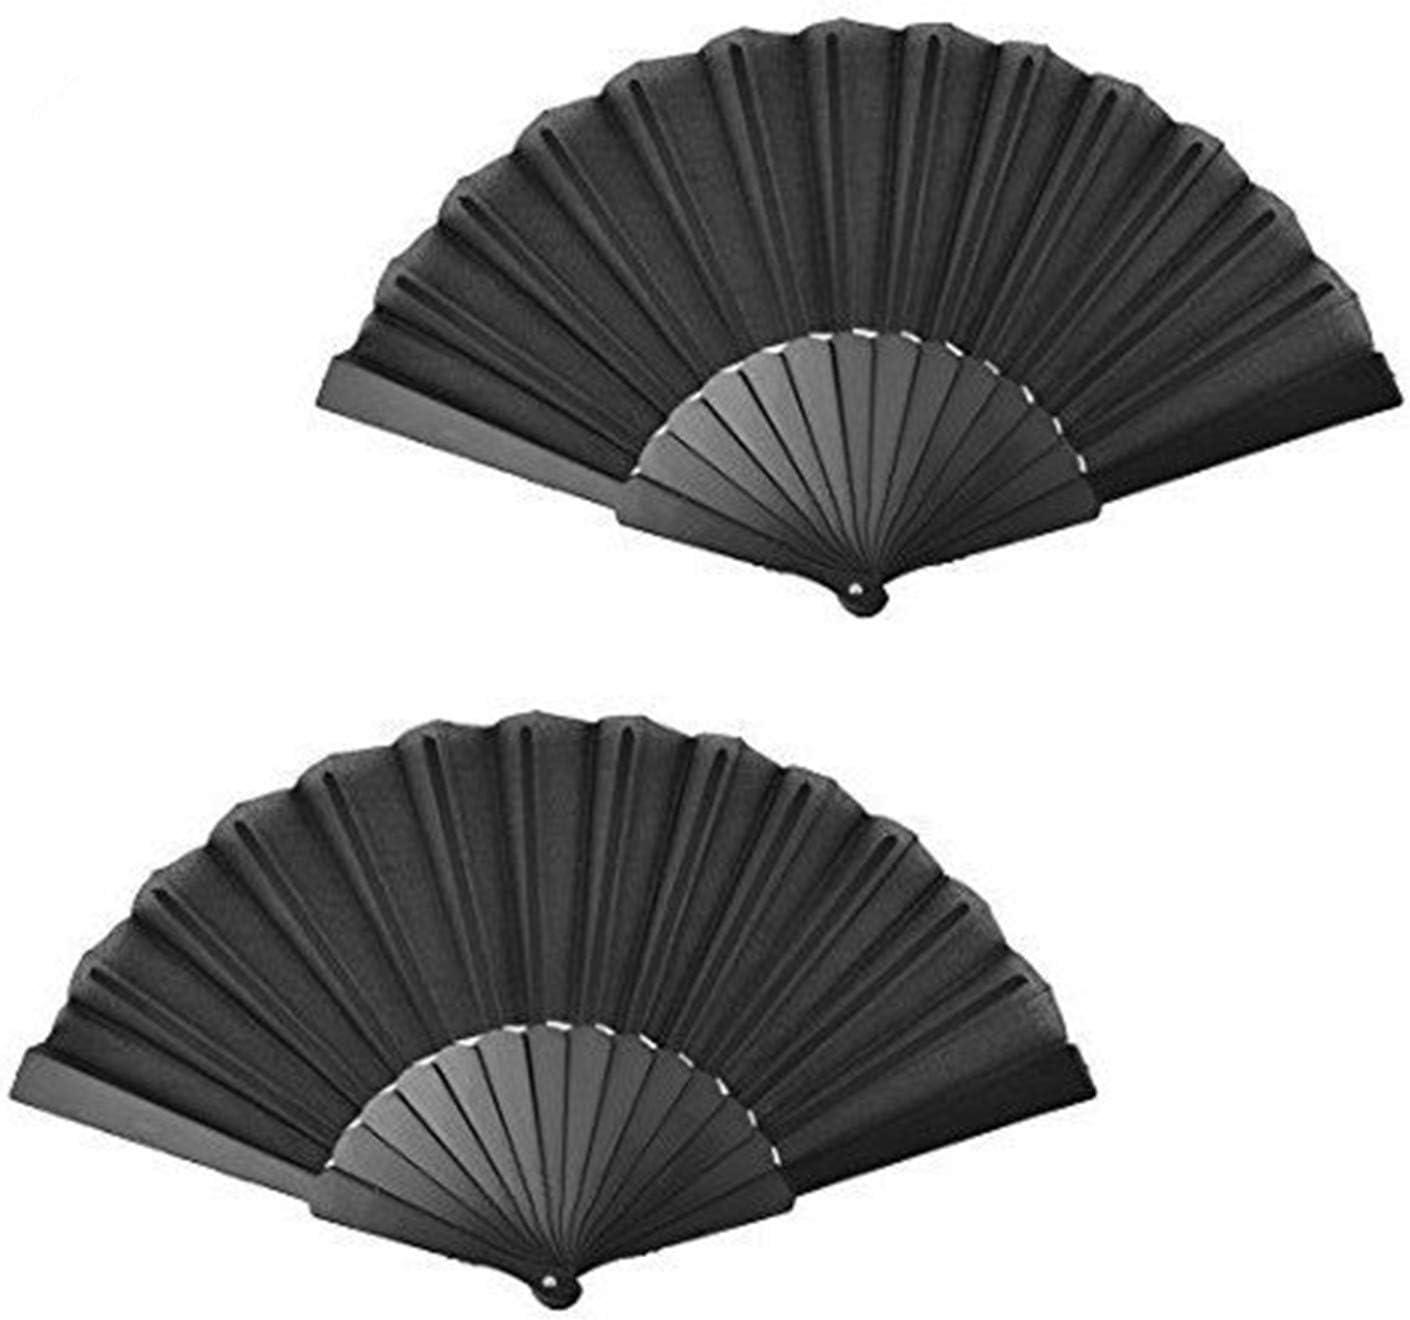 XMHF Festival Dancing Cooling Folding Handheld Fan Black 23cm Length 2Pcs